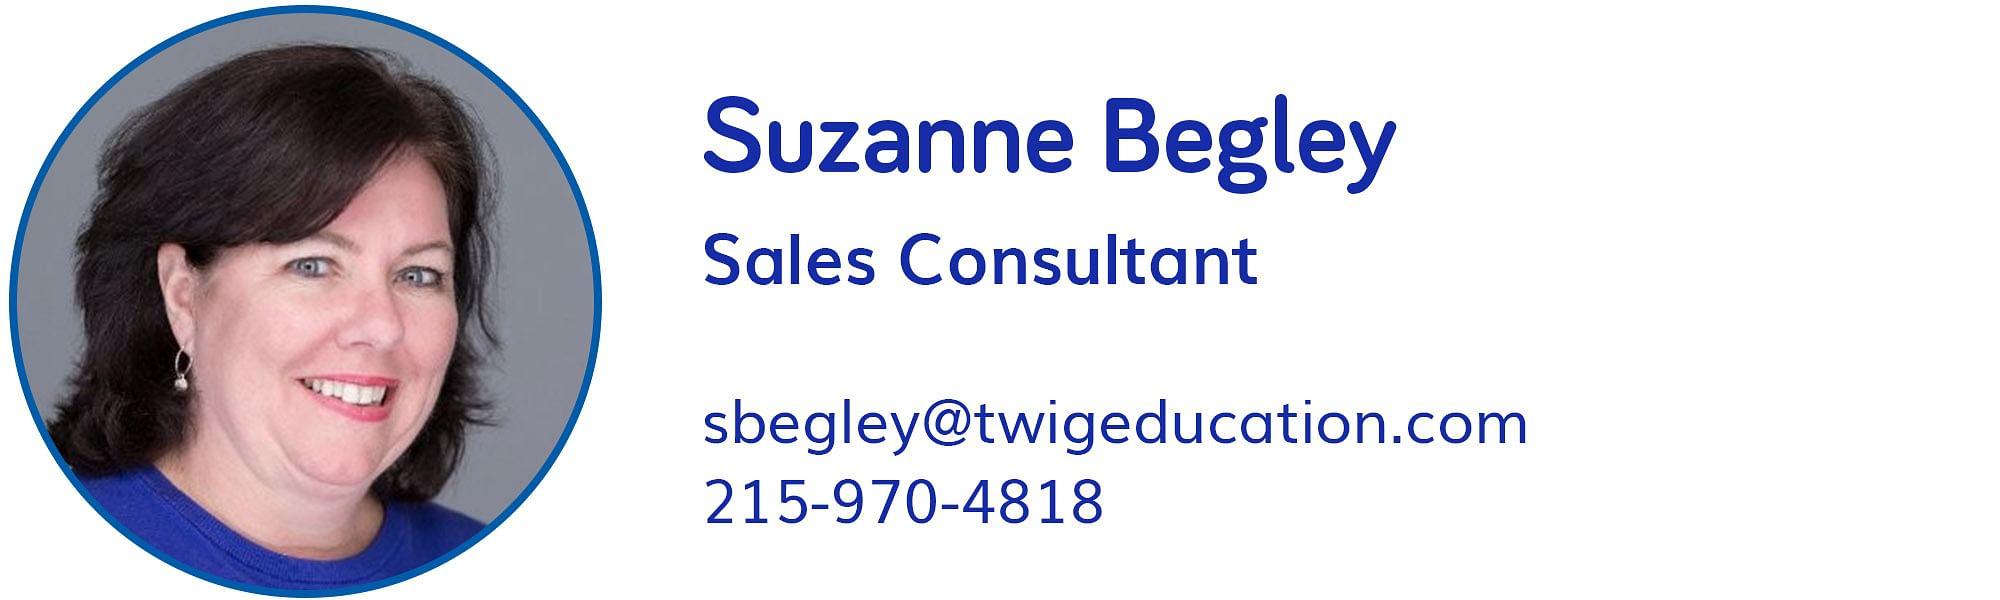 Suzanne Begley, sbegley@twigeducation.com, 215-970-4818